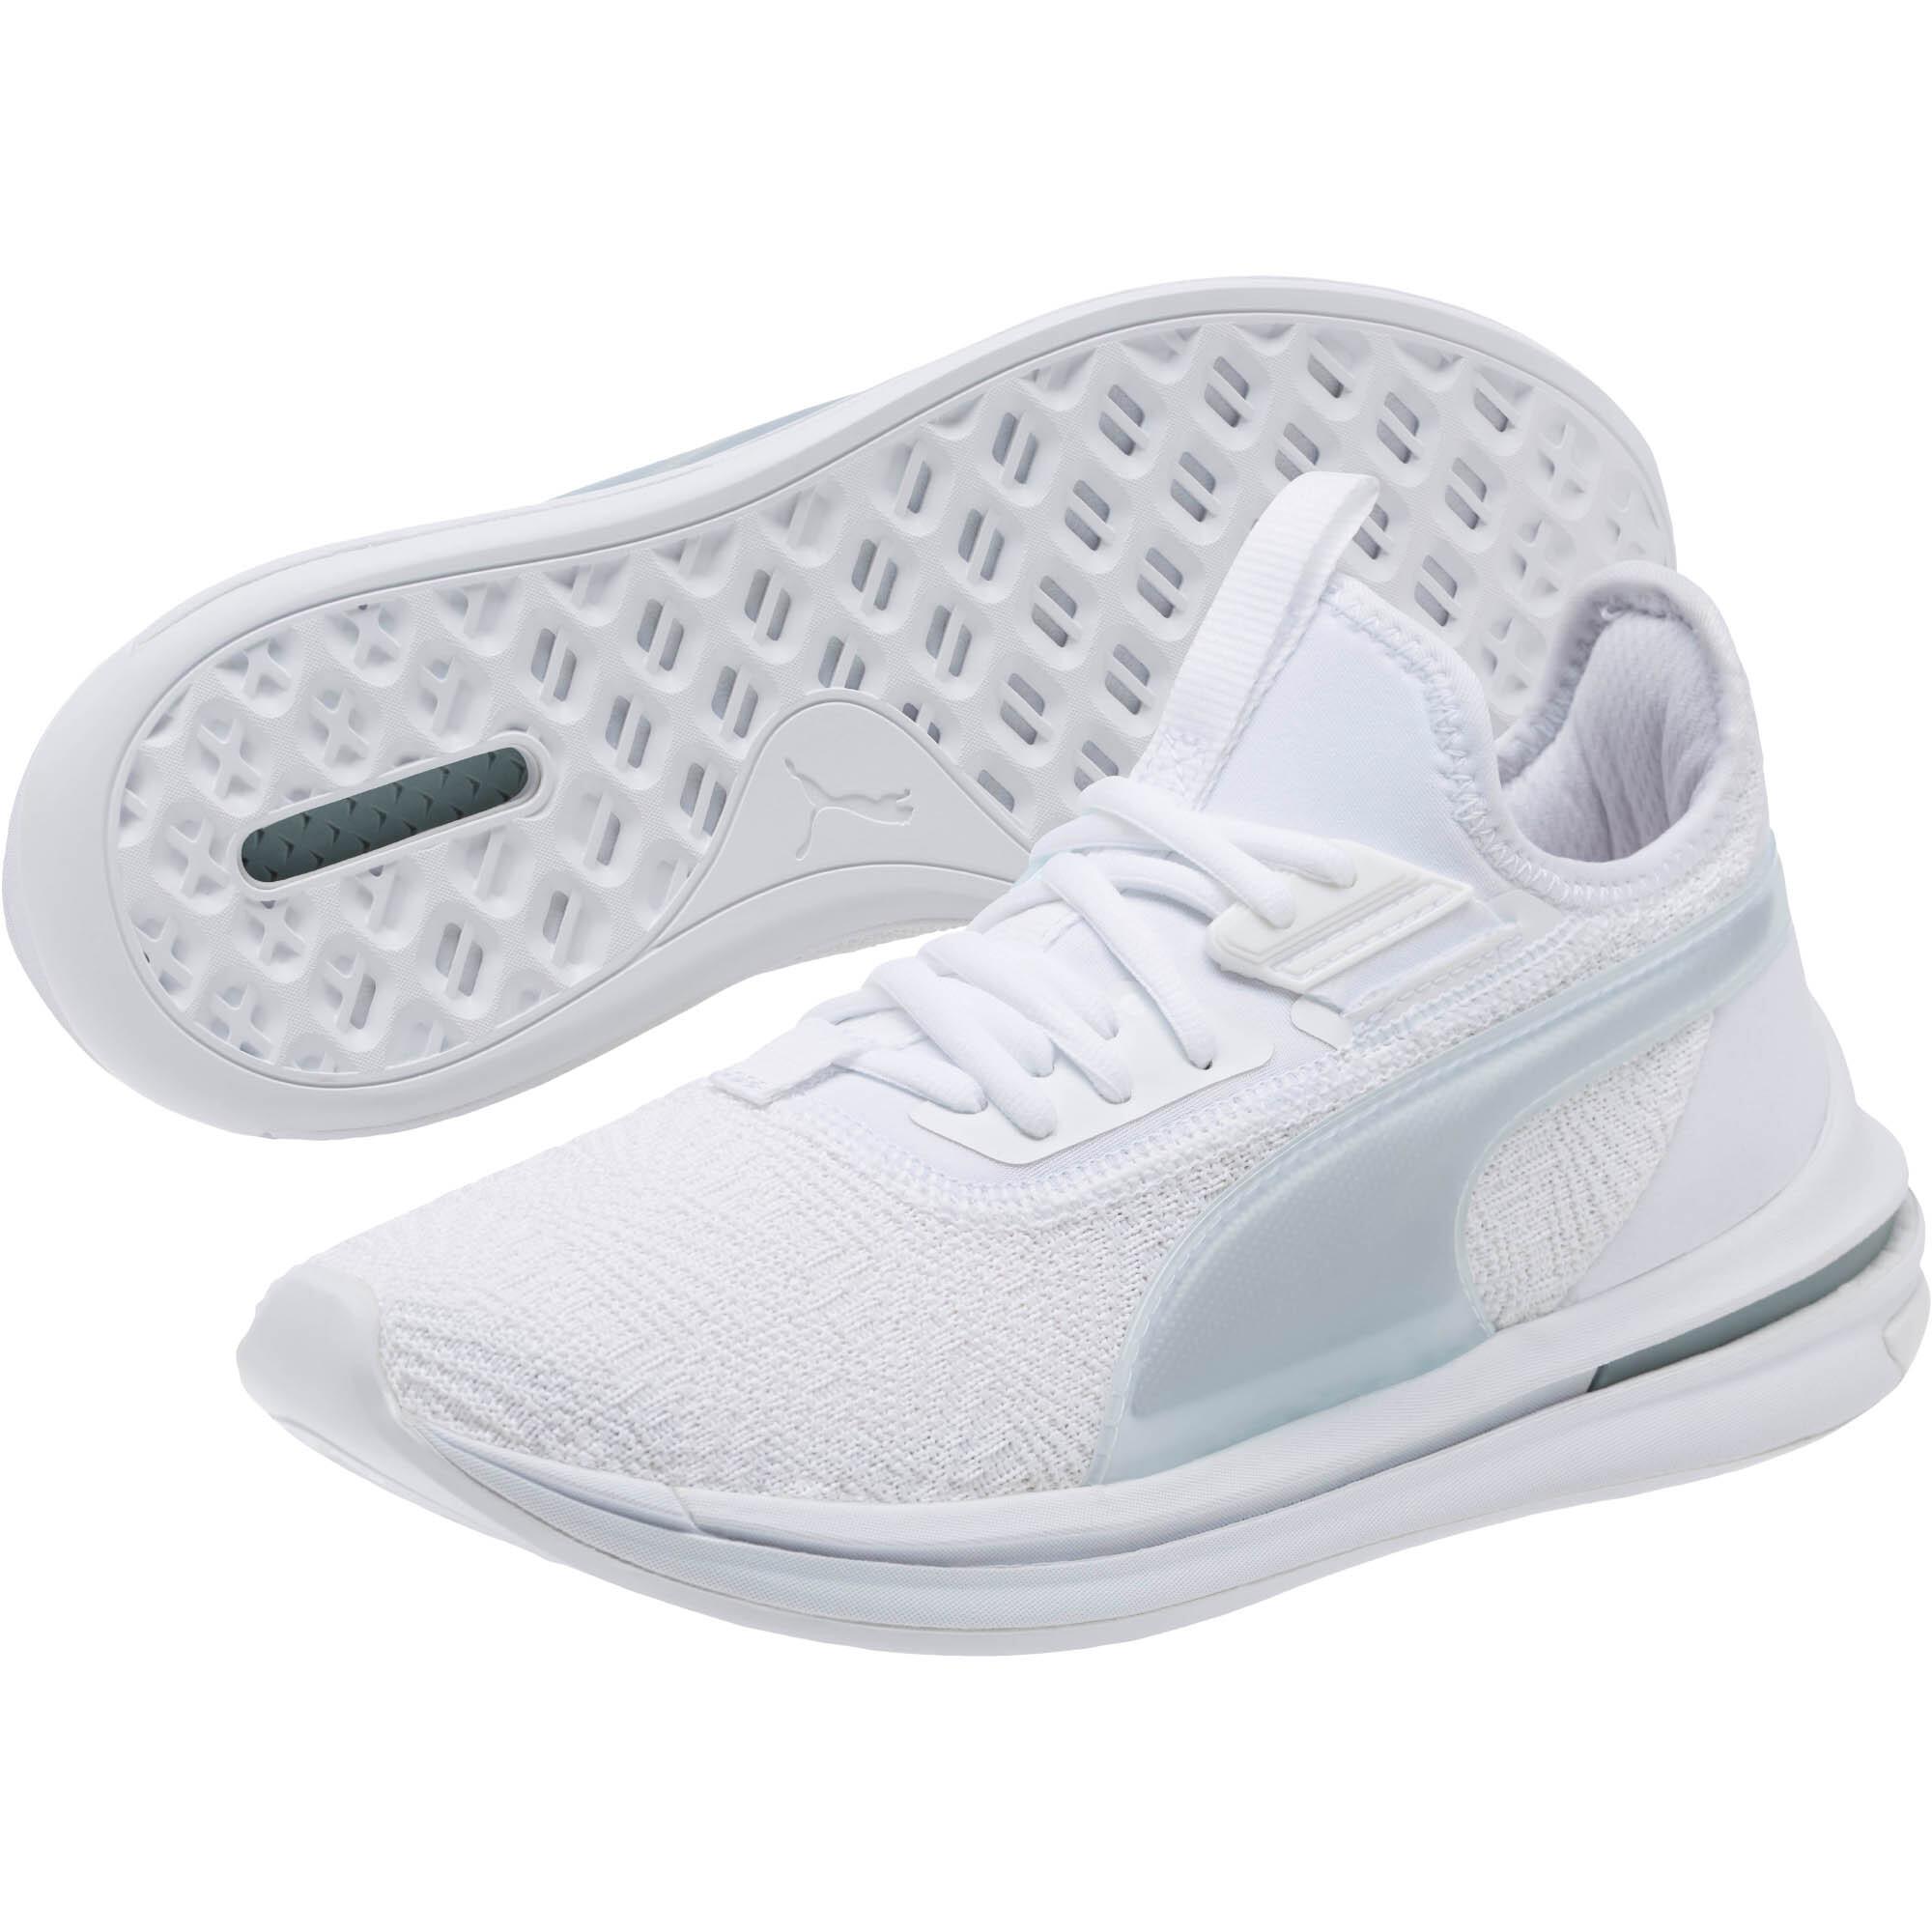 cheap for discount 723e0 96211 Details about PUMA IGNITE Limitless SR-71 Women's Running Shoes Women Shoe  Running